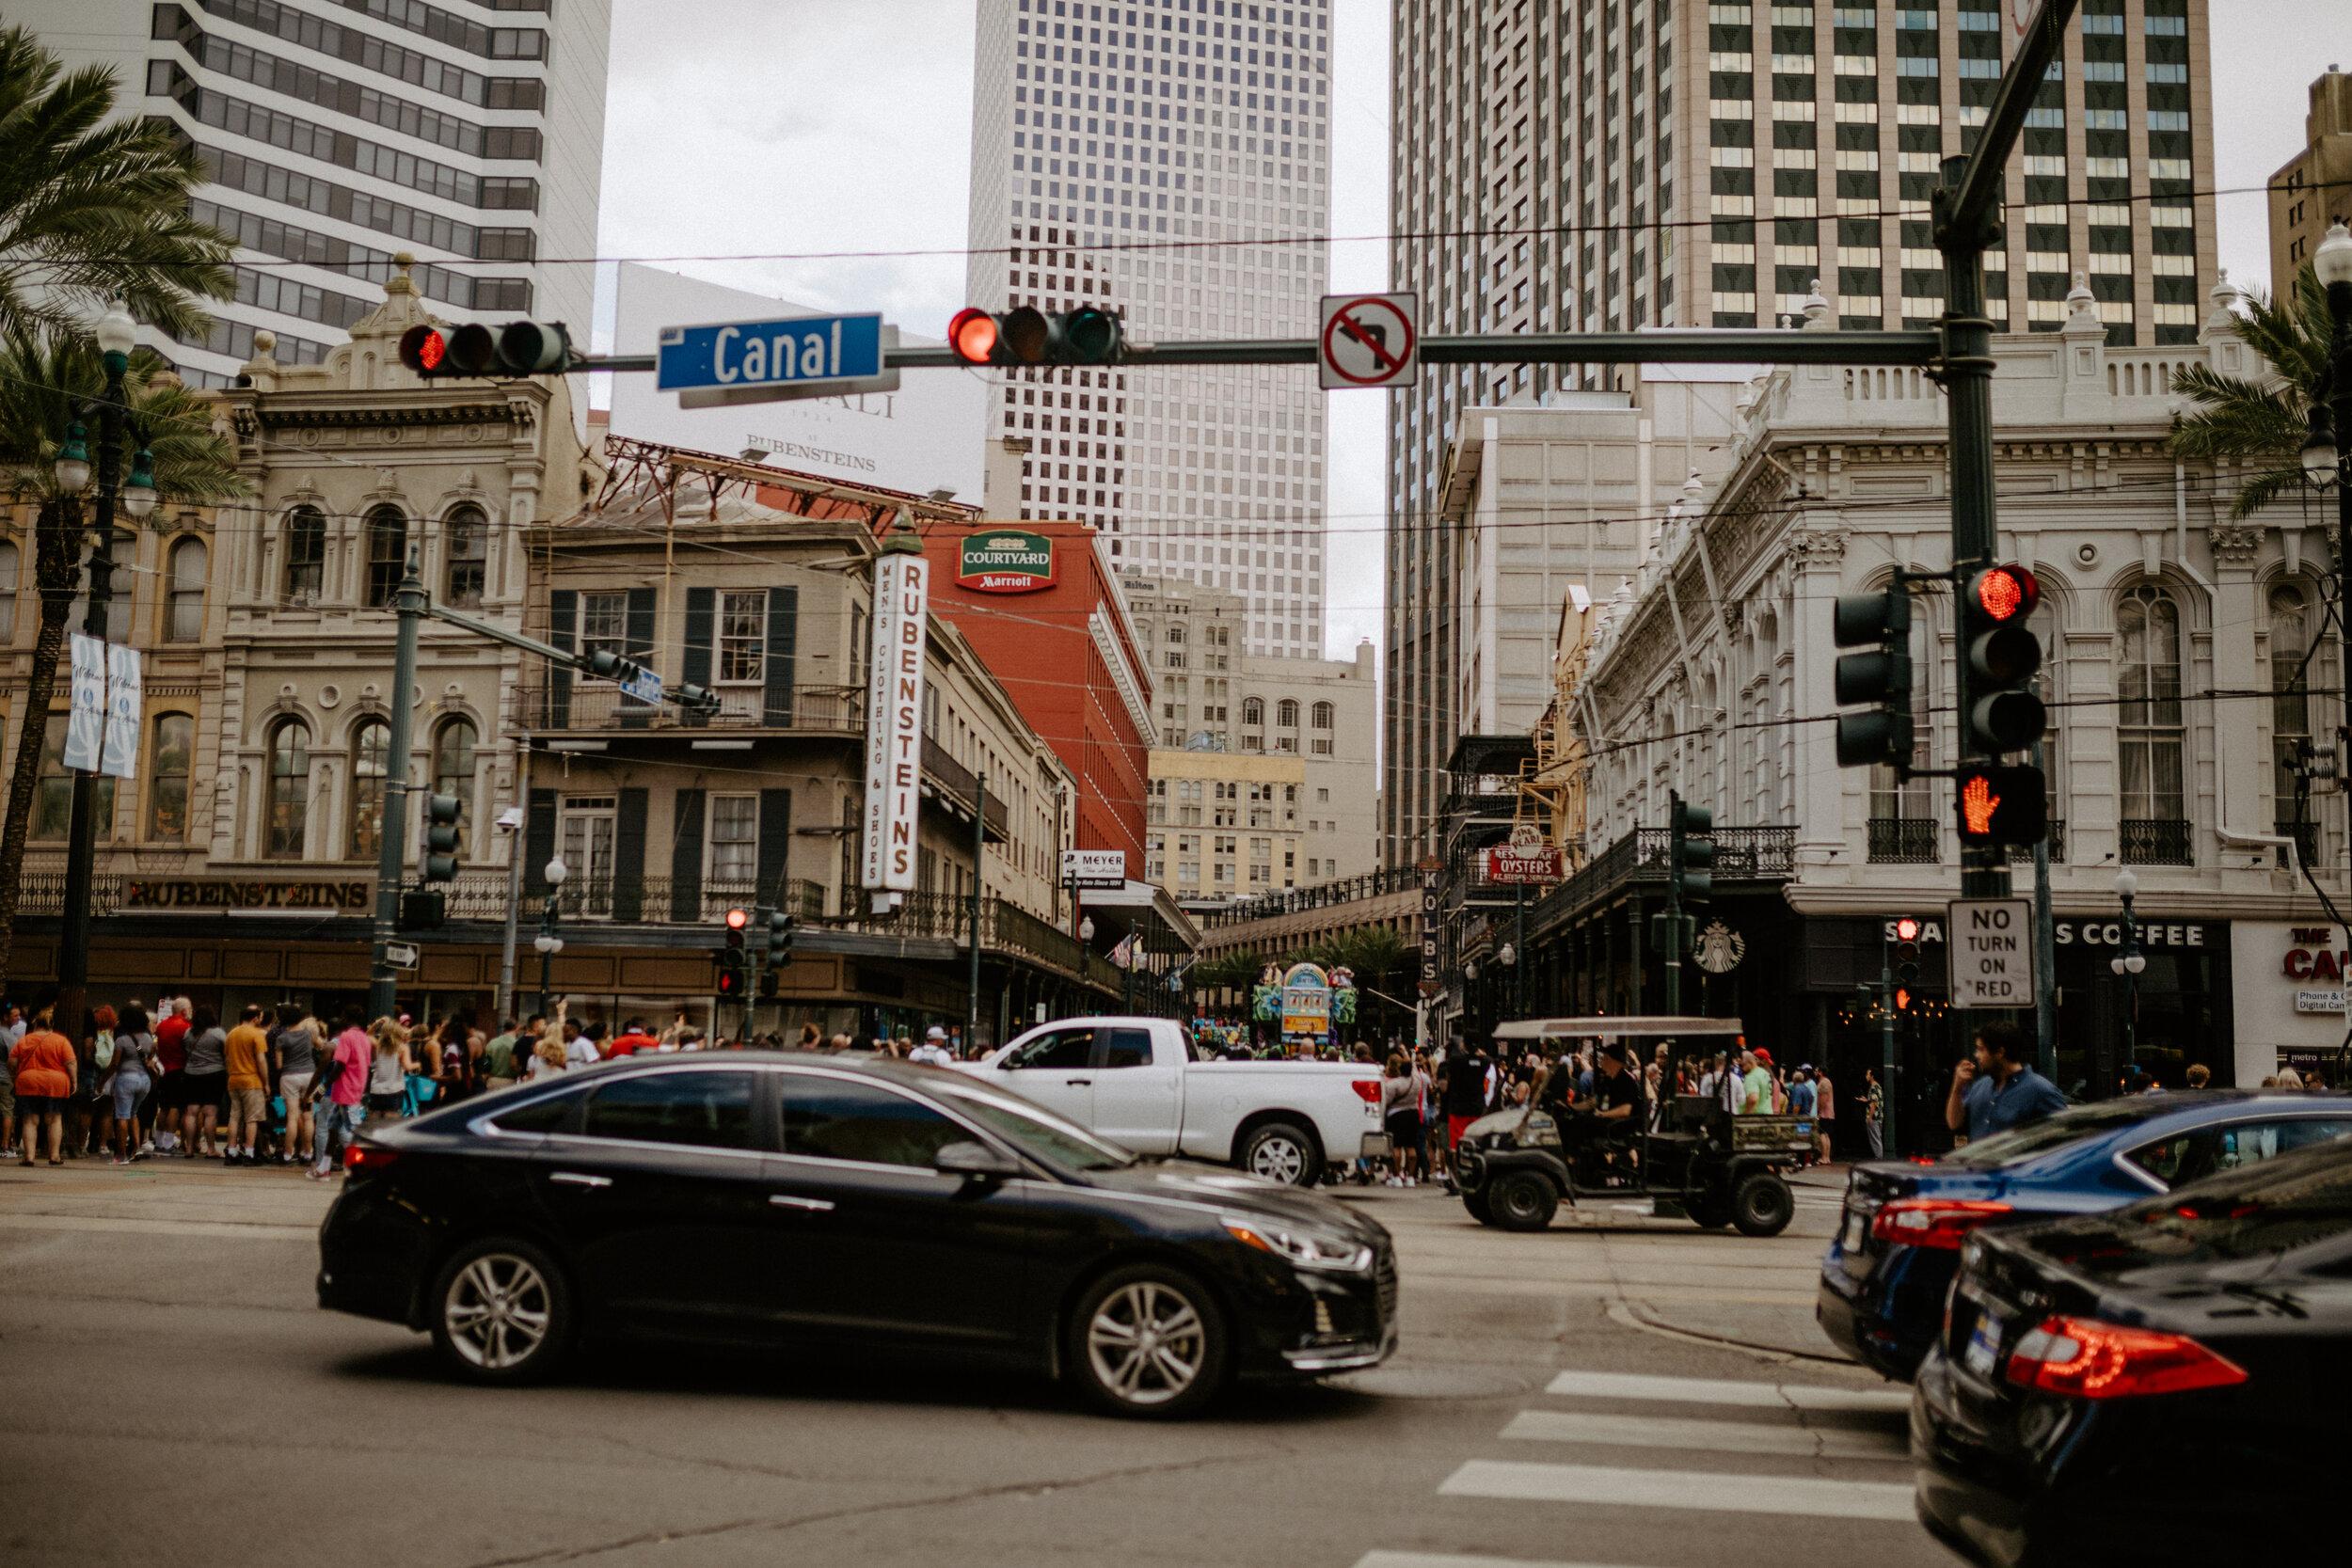 Canal street New Orleans Louisiana.JPG